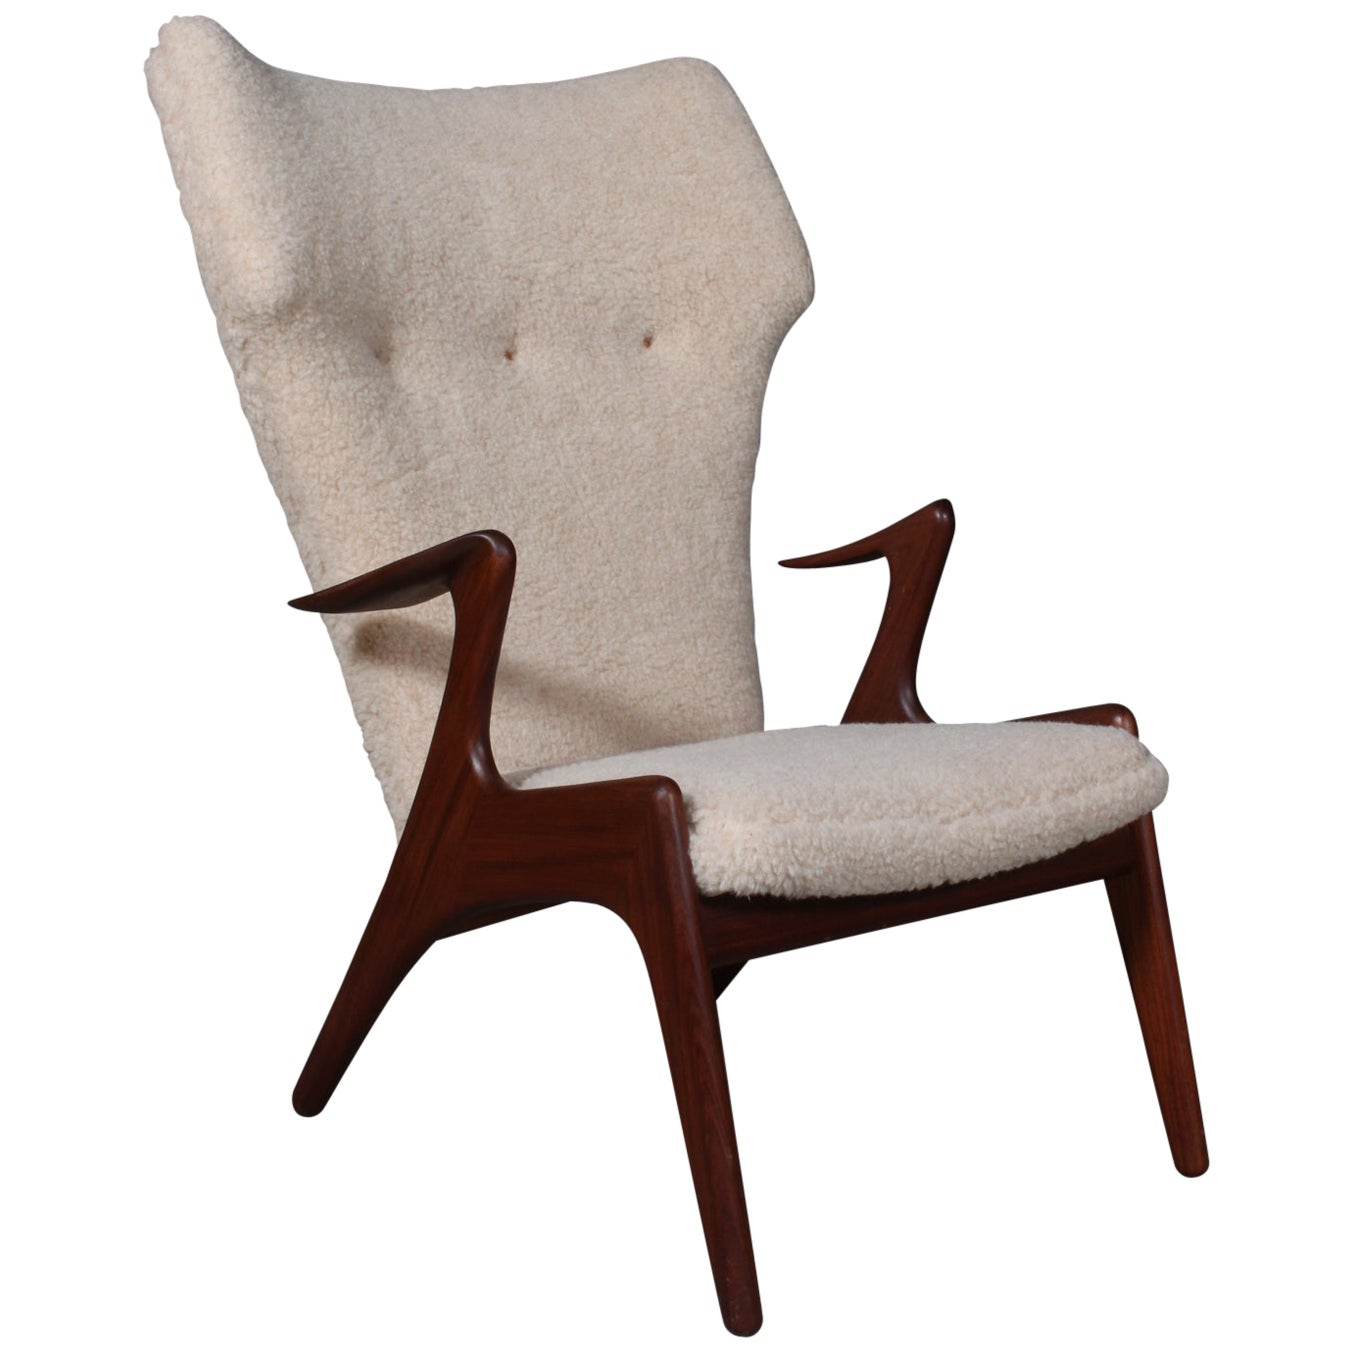 Kurt Østervig Lounge Chair in Sheepskin